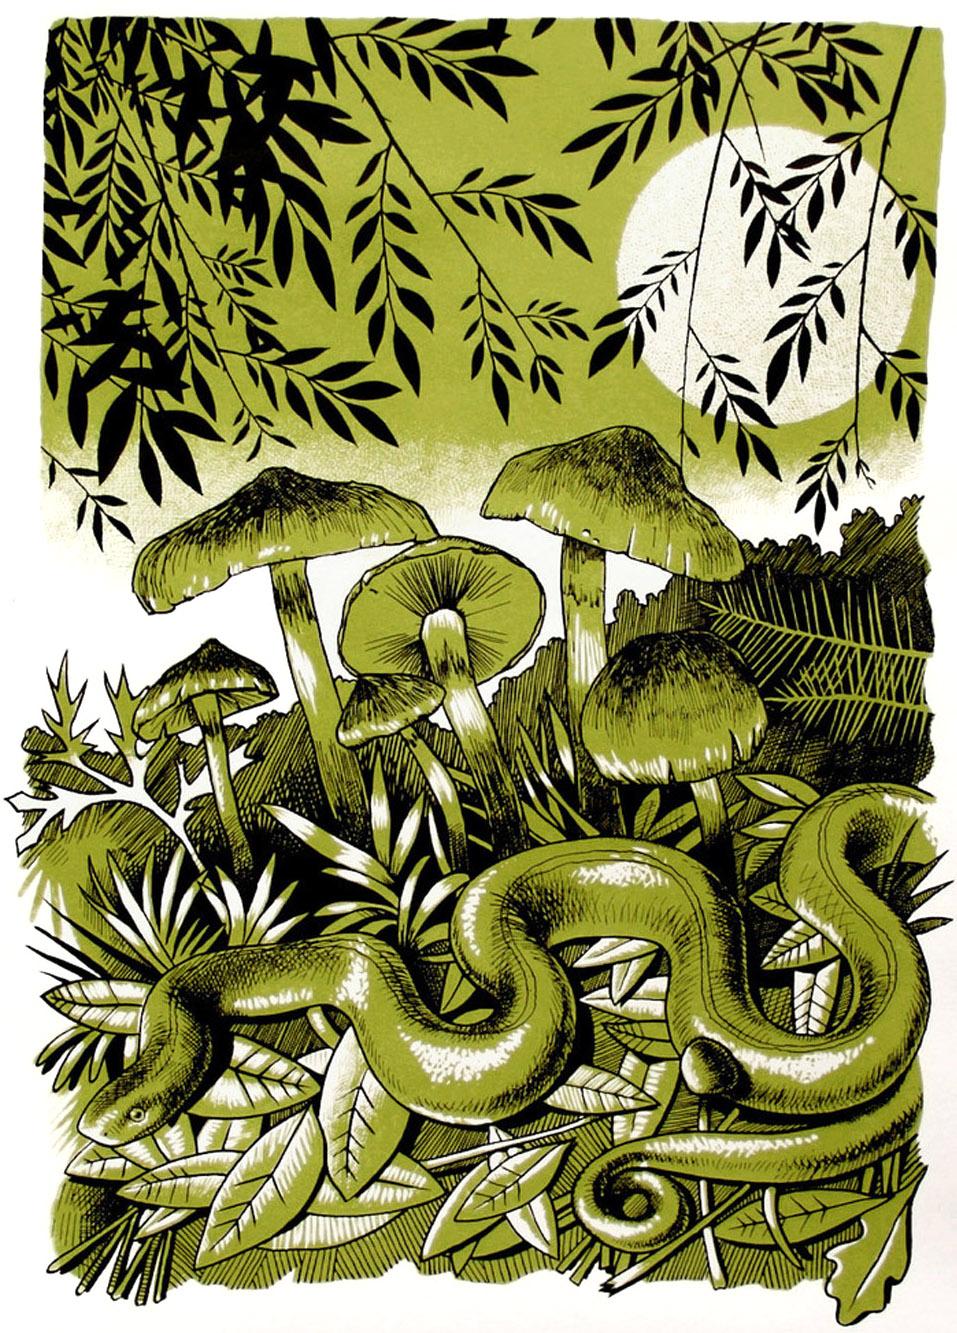 'The Last Snake'